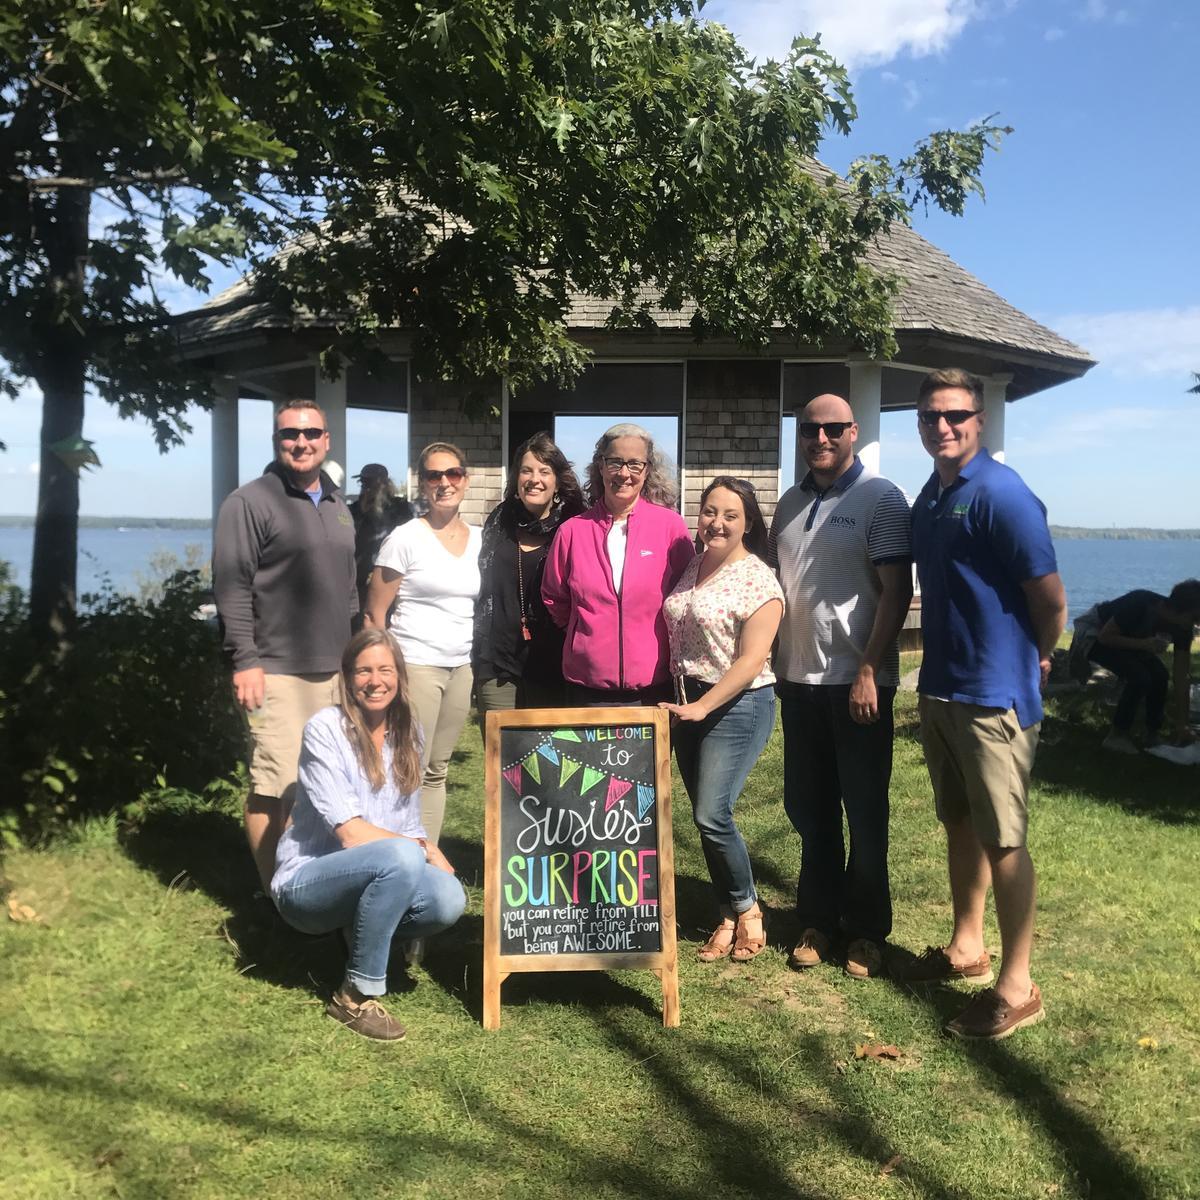 TILT Staff at Susie's surprise retirement party at Picnic Point